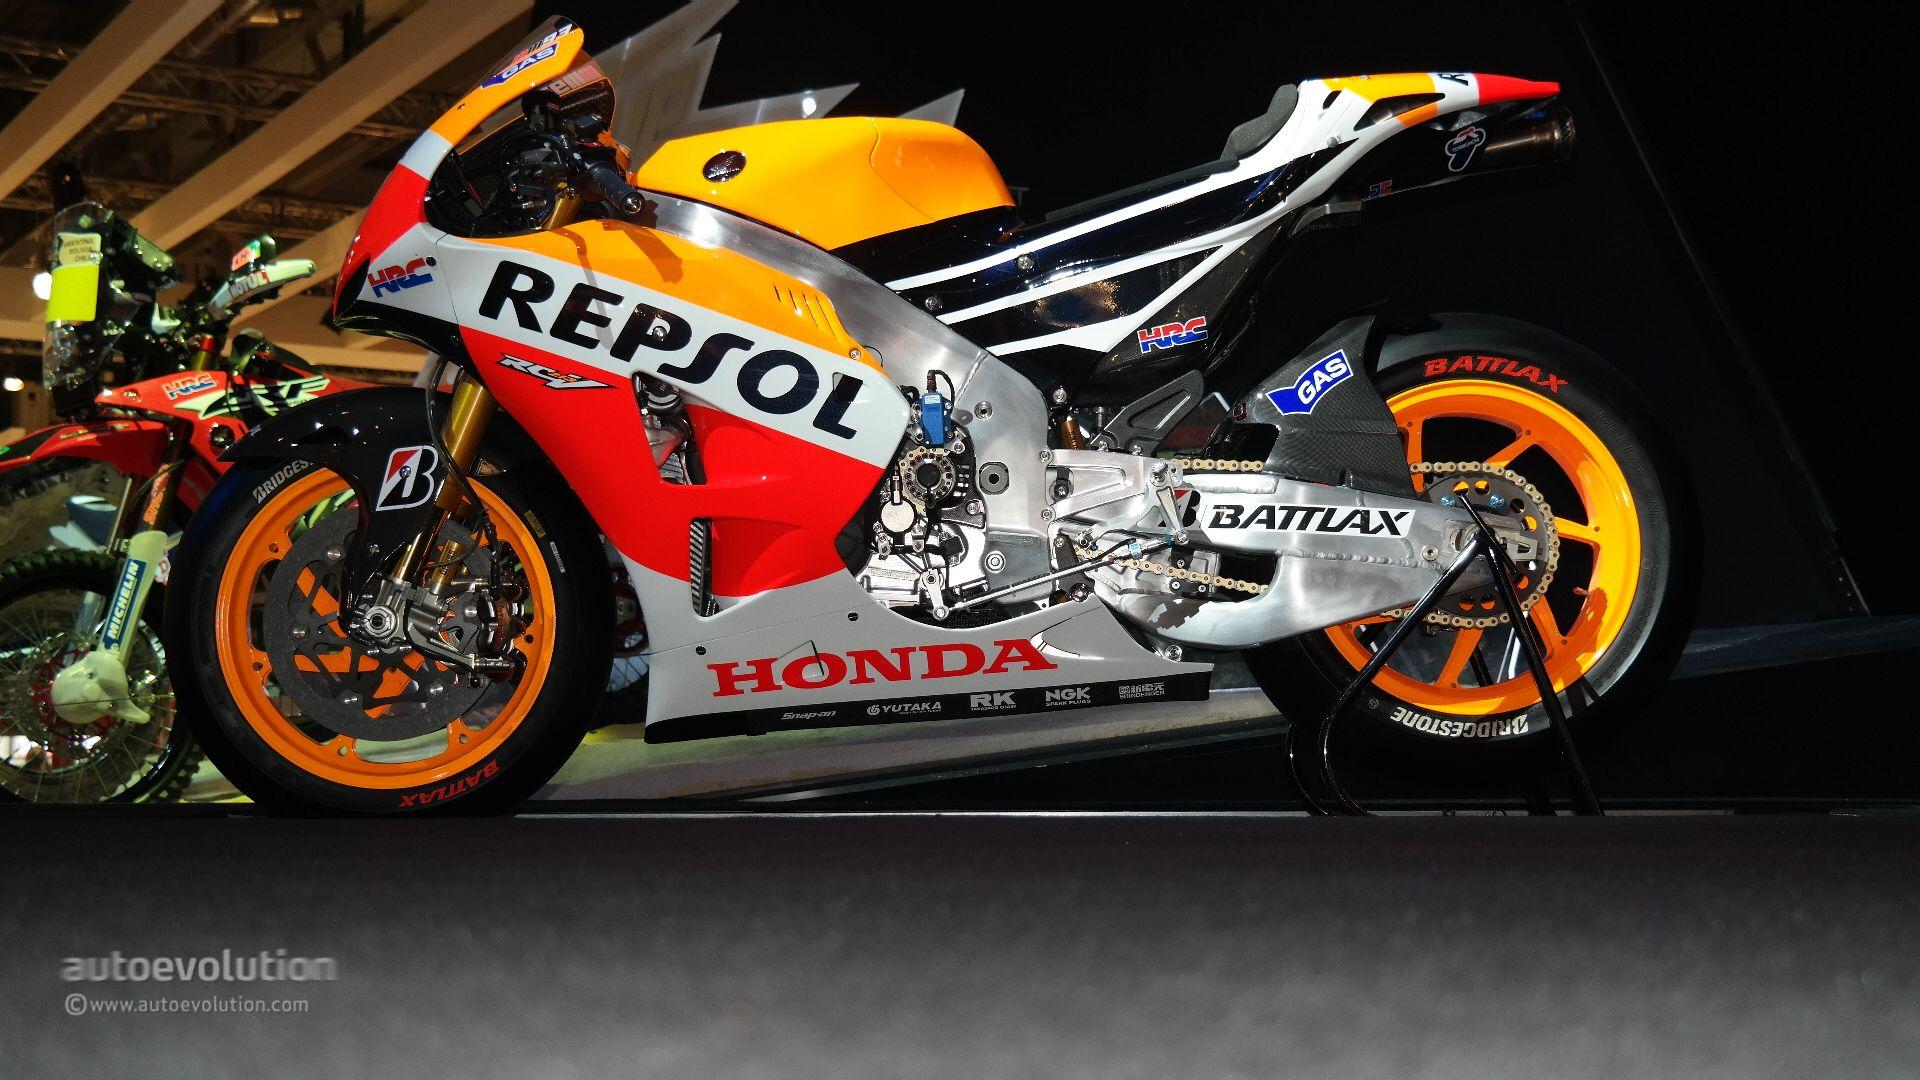 Honda Unveils RC213V-S Road-Legal Hyperbike Prototype at EICMA 2014